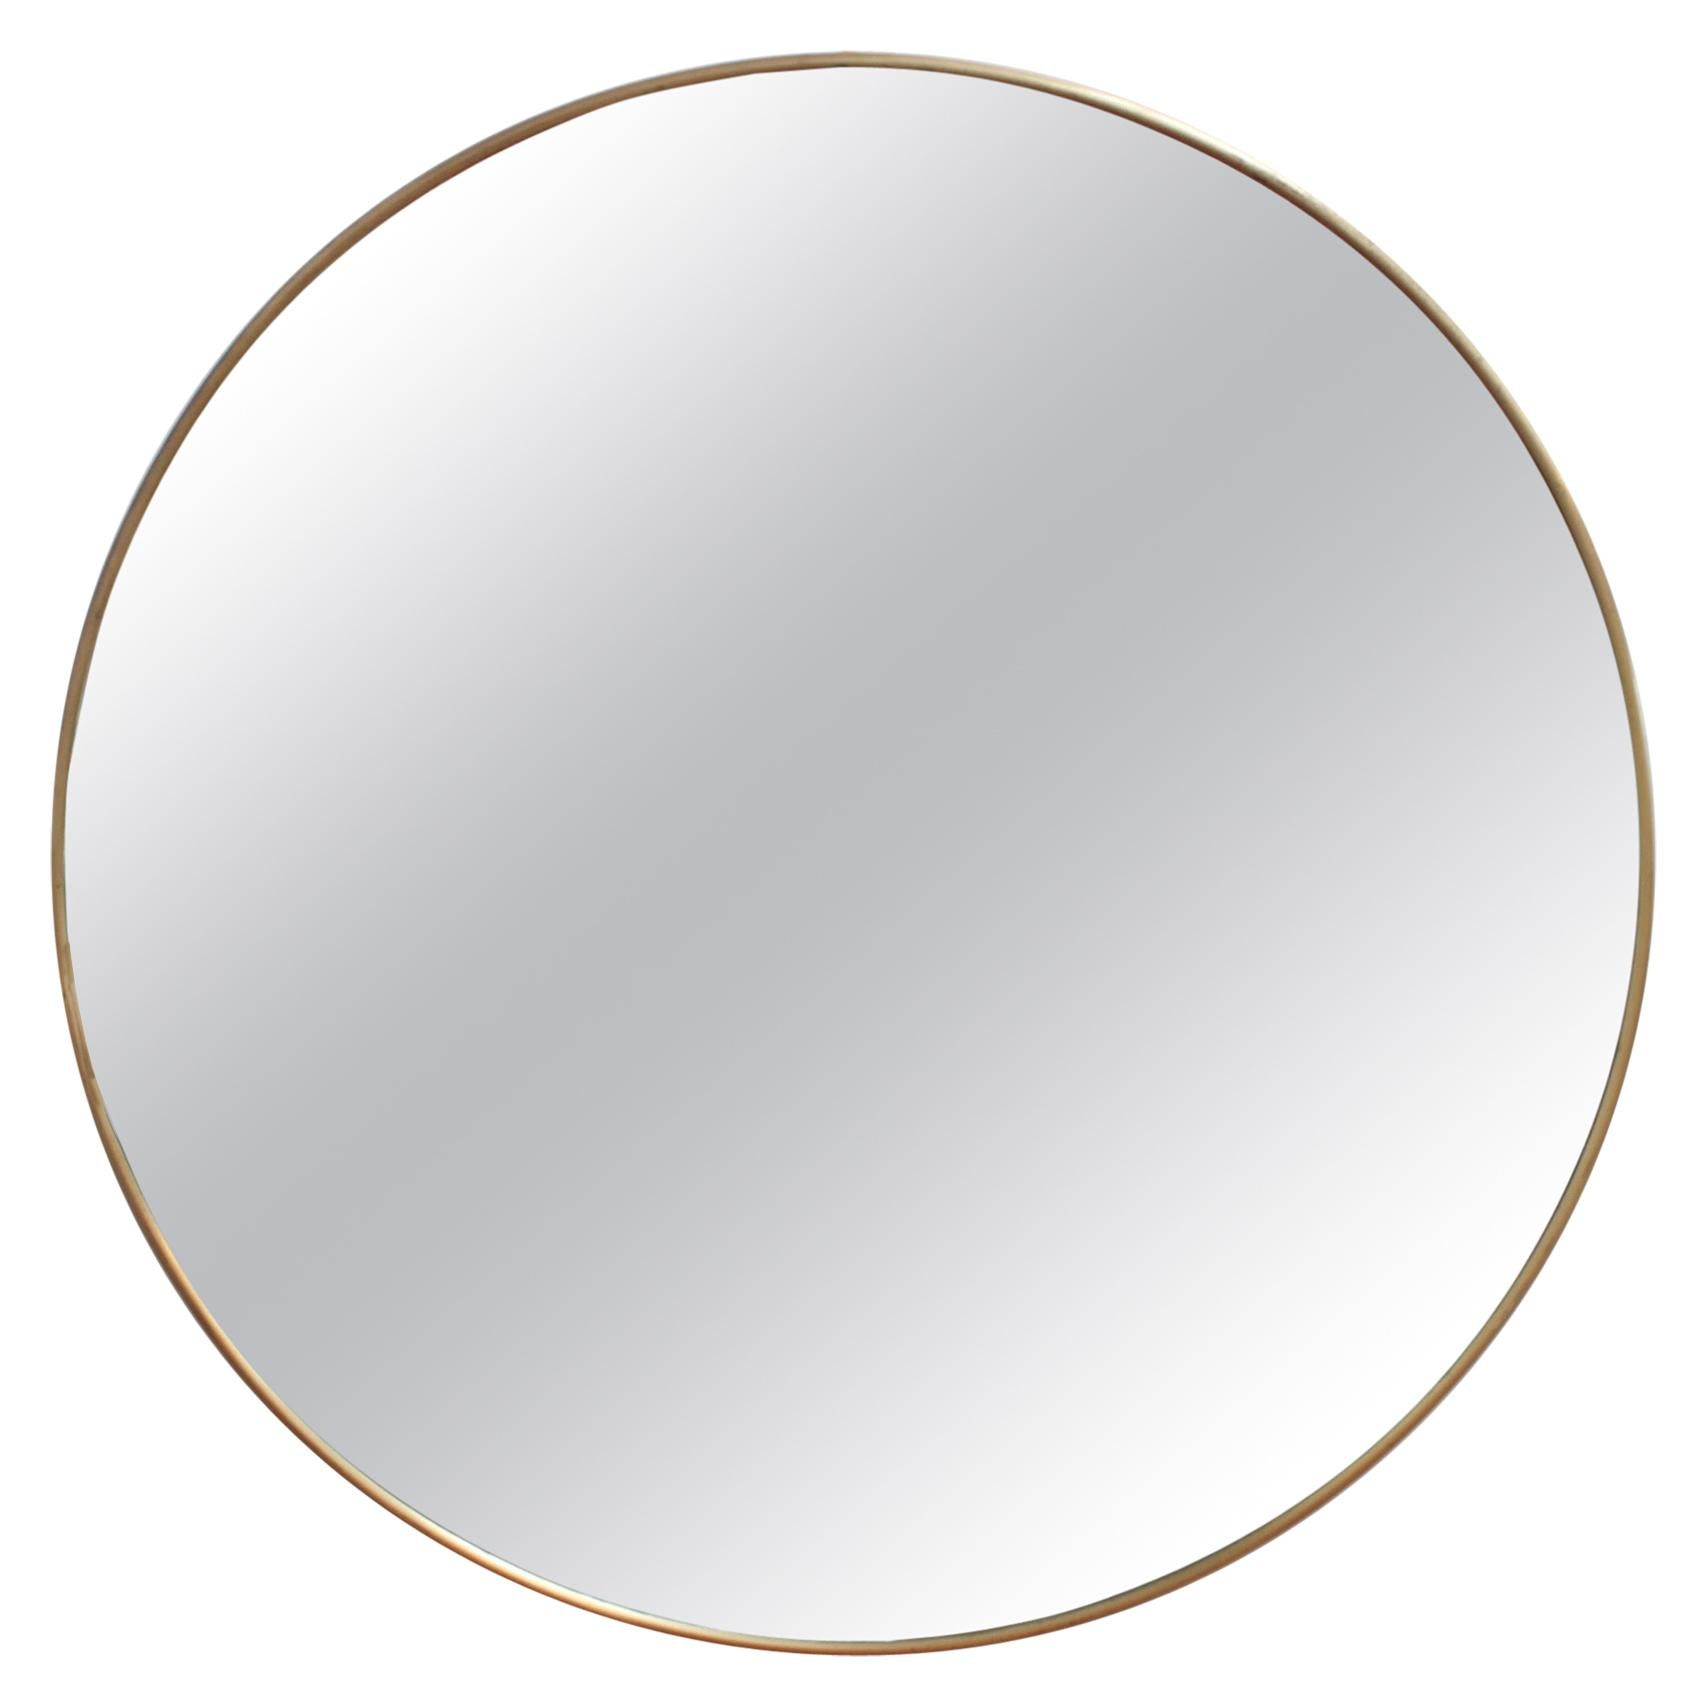 Vintage Italian Wall Mirror with Brass Frame 'circa 1950s'